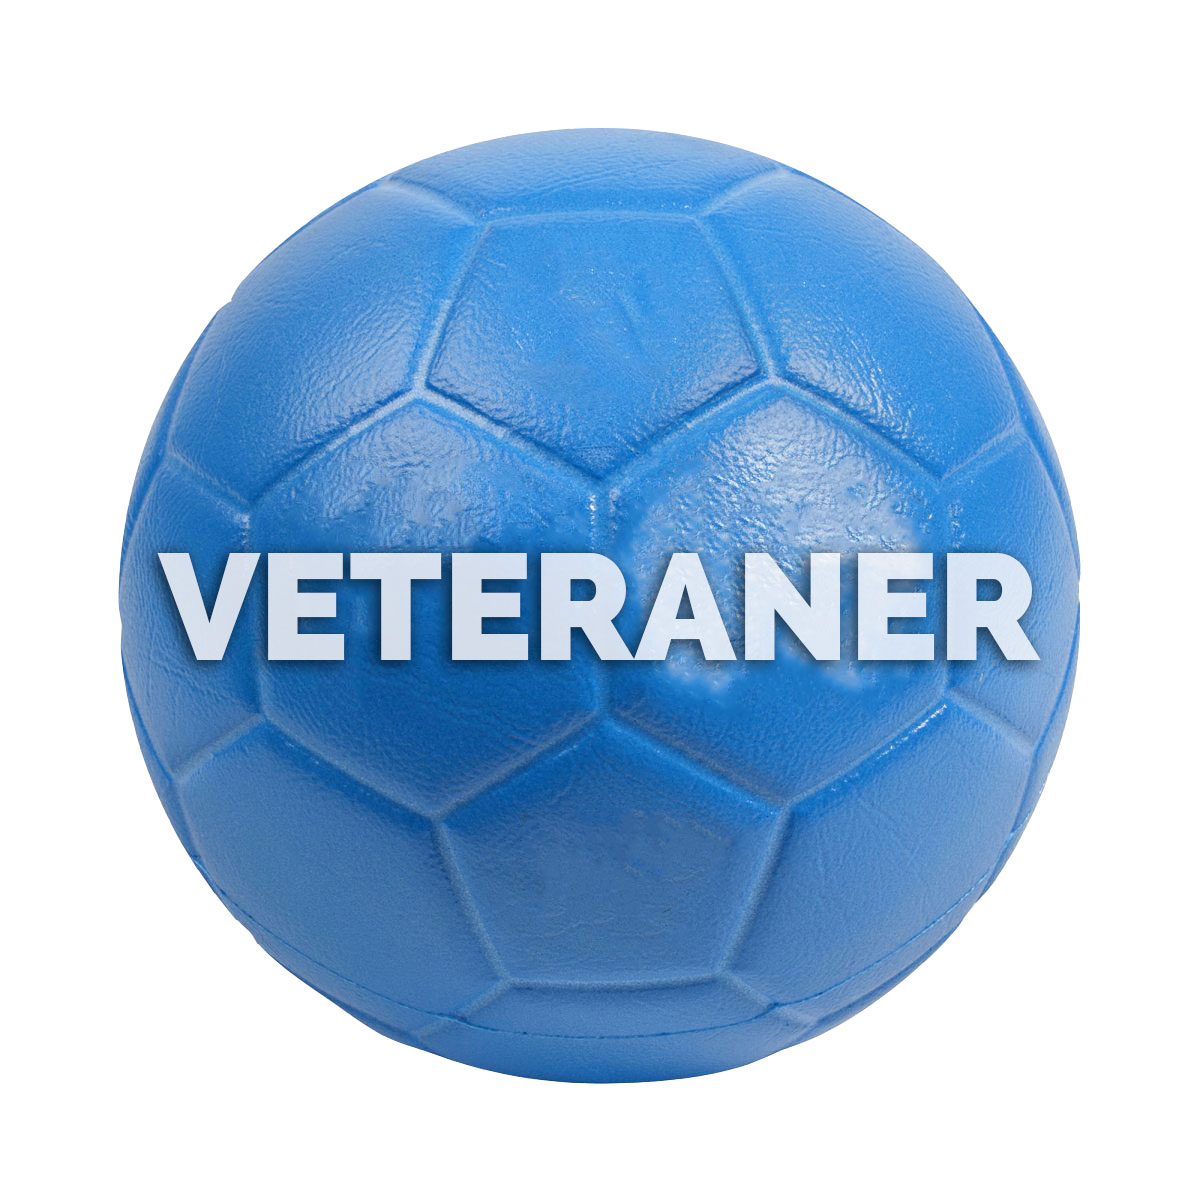 håndboldt veteraner